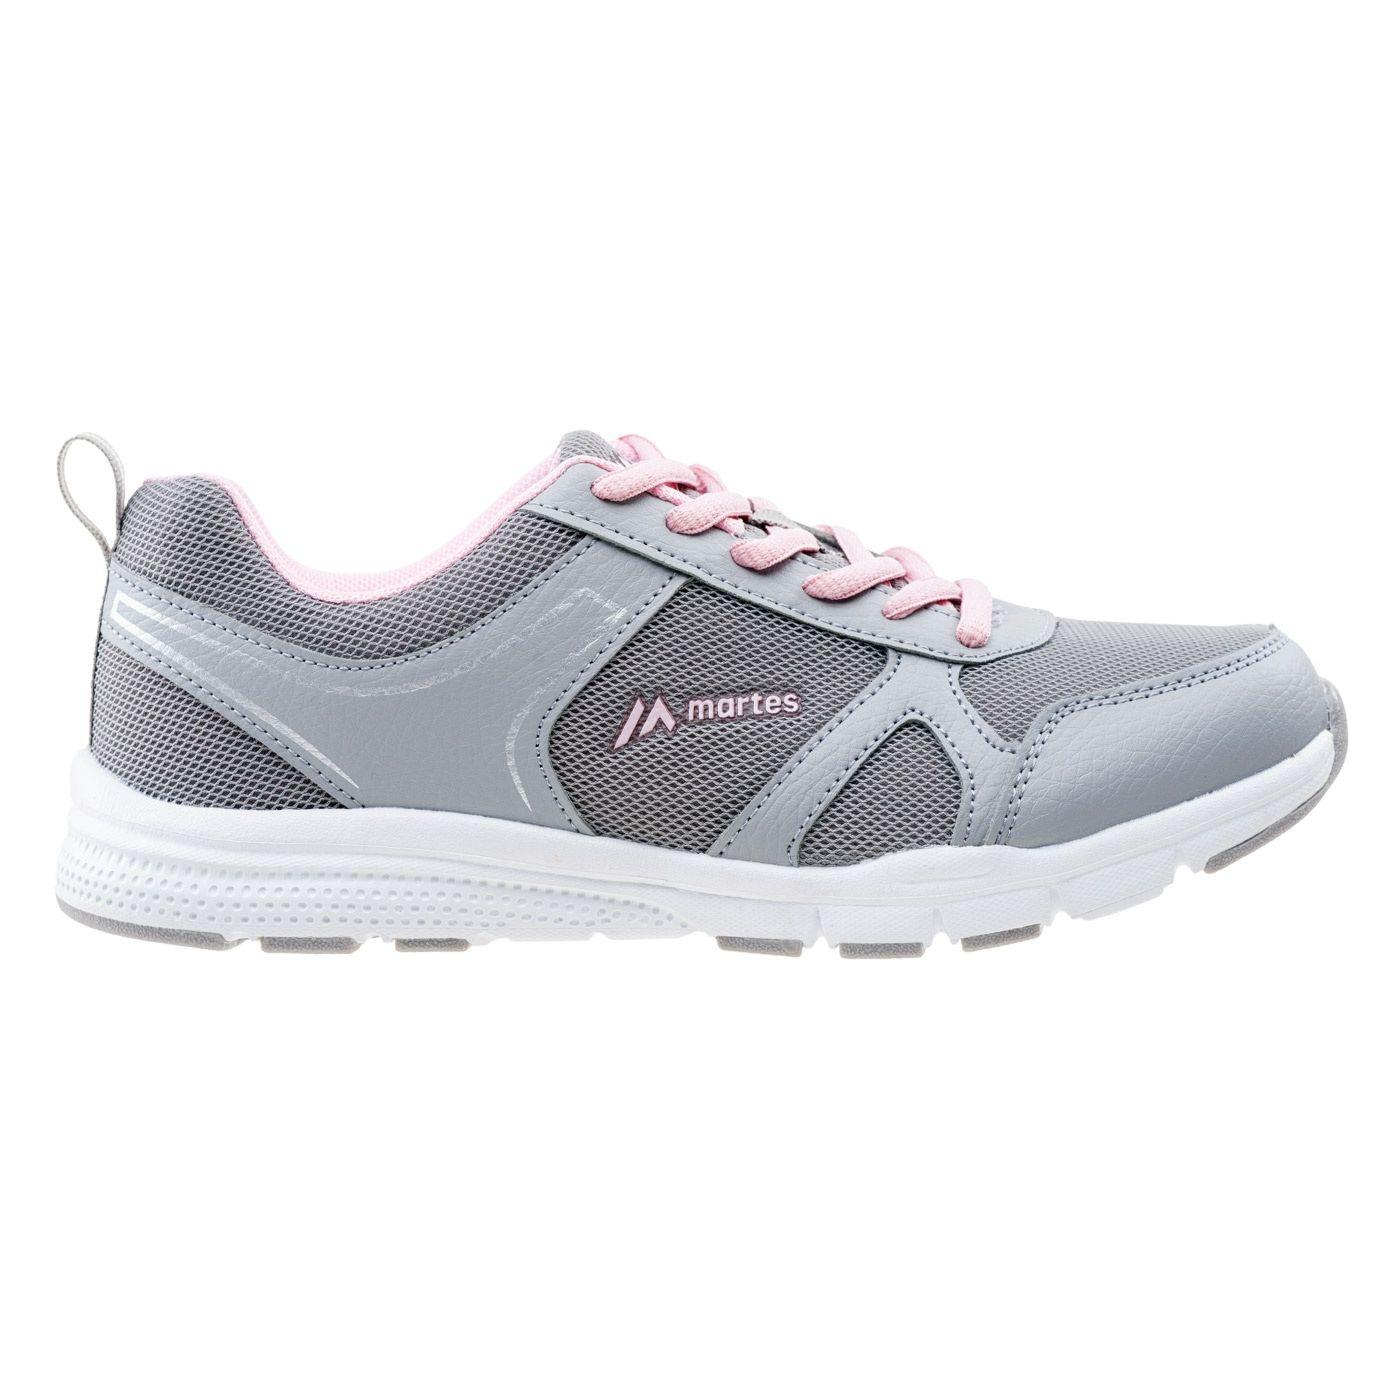 Damskie Buty Sportowe Celari Wo S Light Grey Pink Silver Martes Sklepiguana Pl